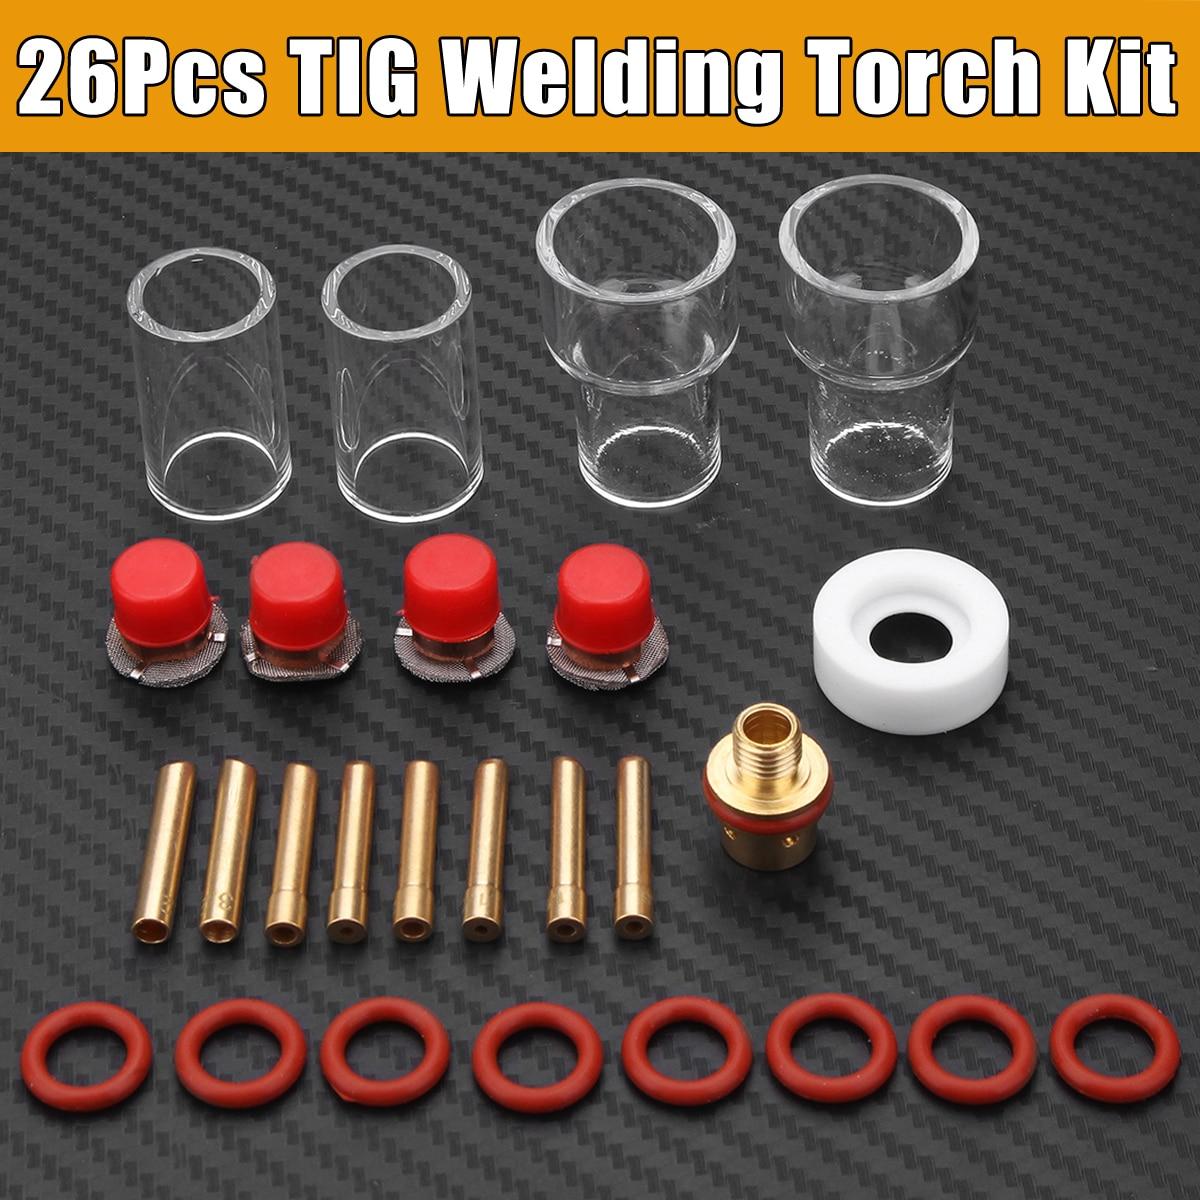 26P[cs Professional Practical Durable TIG Welding Accessories Torch Stubby Gas Lens Glass Nozzle Cup Kit For WP-9/20/25 48 pcs tig welding kit gas lens for tig welding torch wp 9 wp 20 wp 25 wz8 3 32